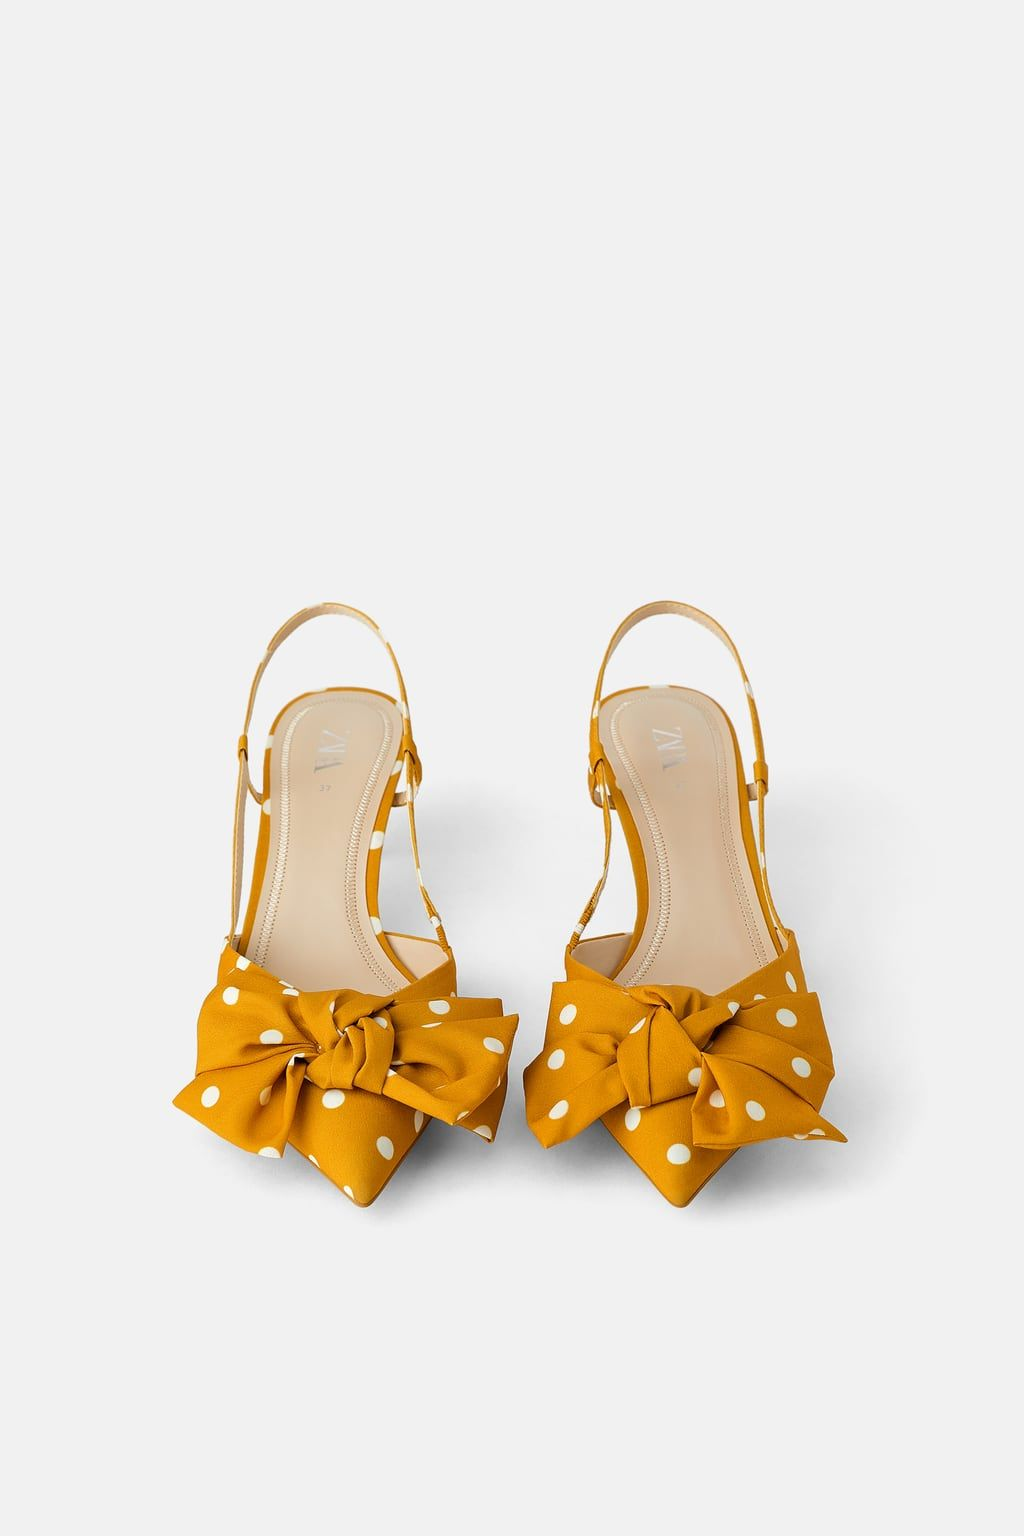 Polka Dot Kitten Heel Shoes With Bow Detail Shoes Woman Zara International Kitten Heel Shoes Heels Tie Heels